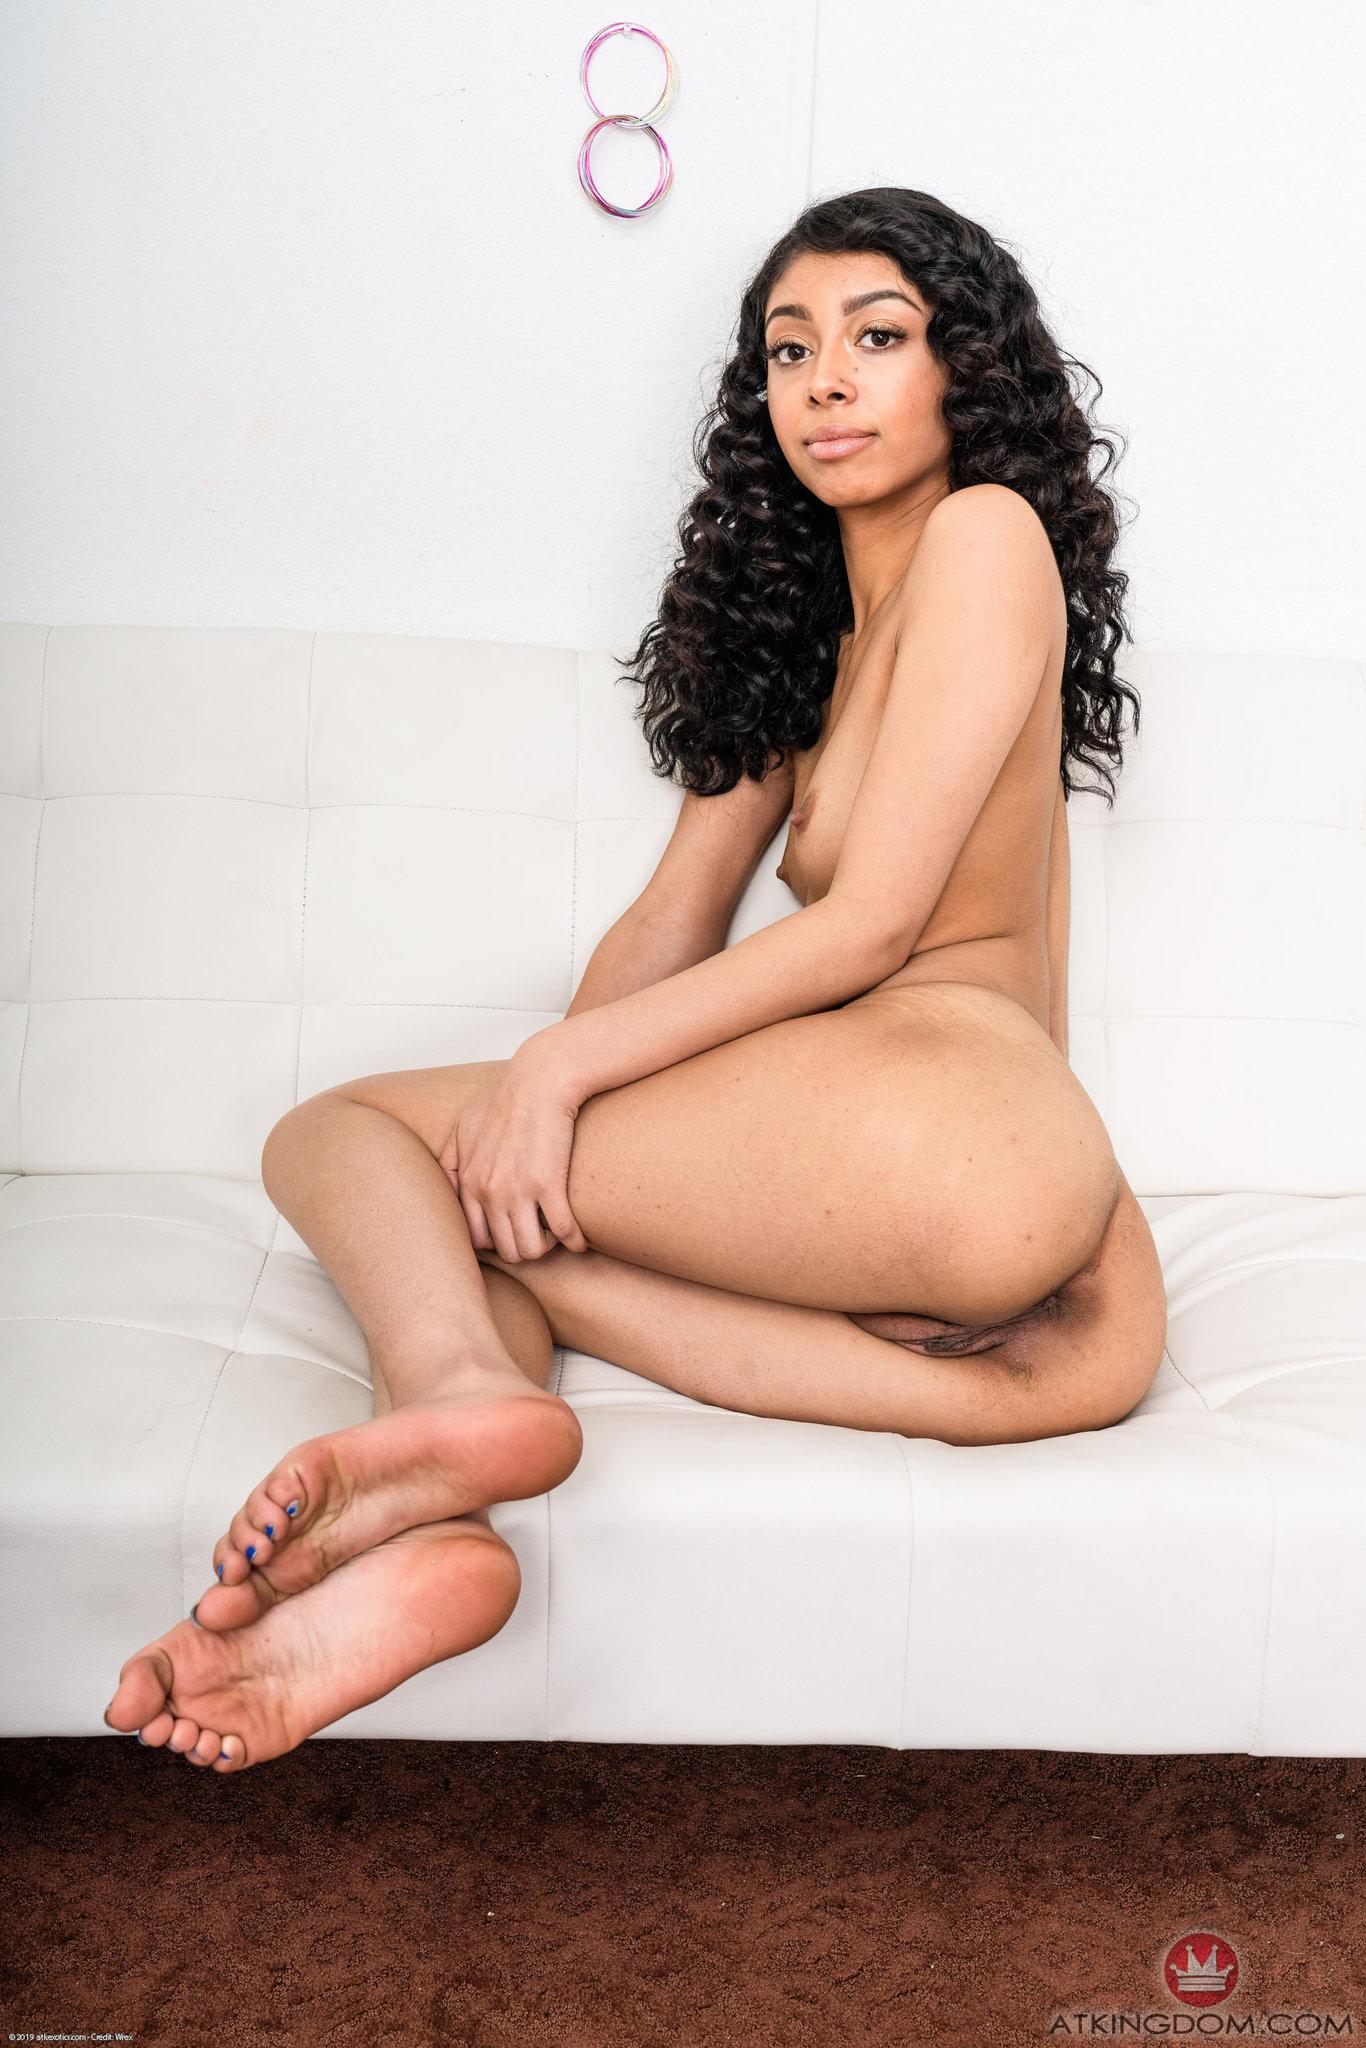 curly blonde babe sucks cock for facial #ass #ebony #fatty #huge #nigga